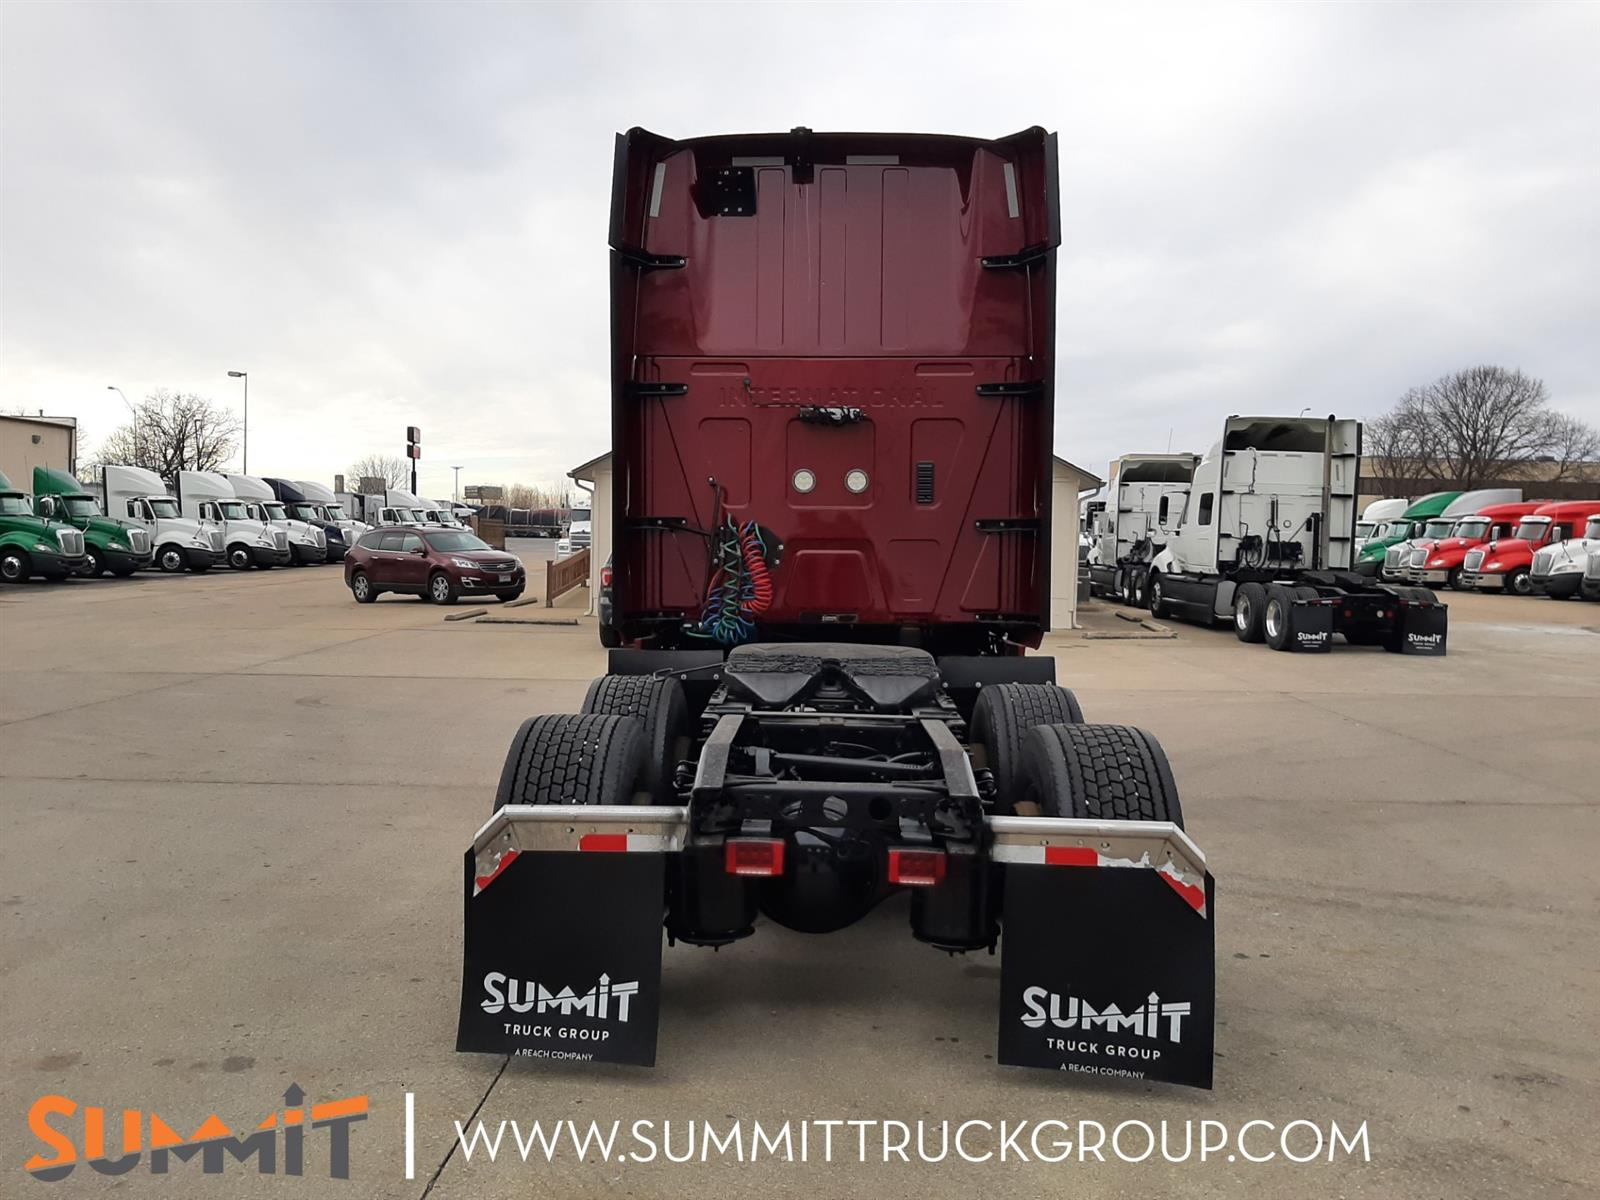 2017 International ProStar+ Sleeper Cab 6x4, Tractor #135N202158 - photo 1